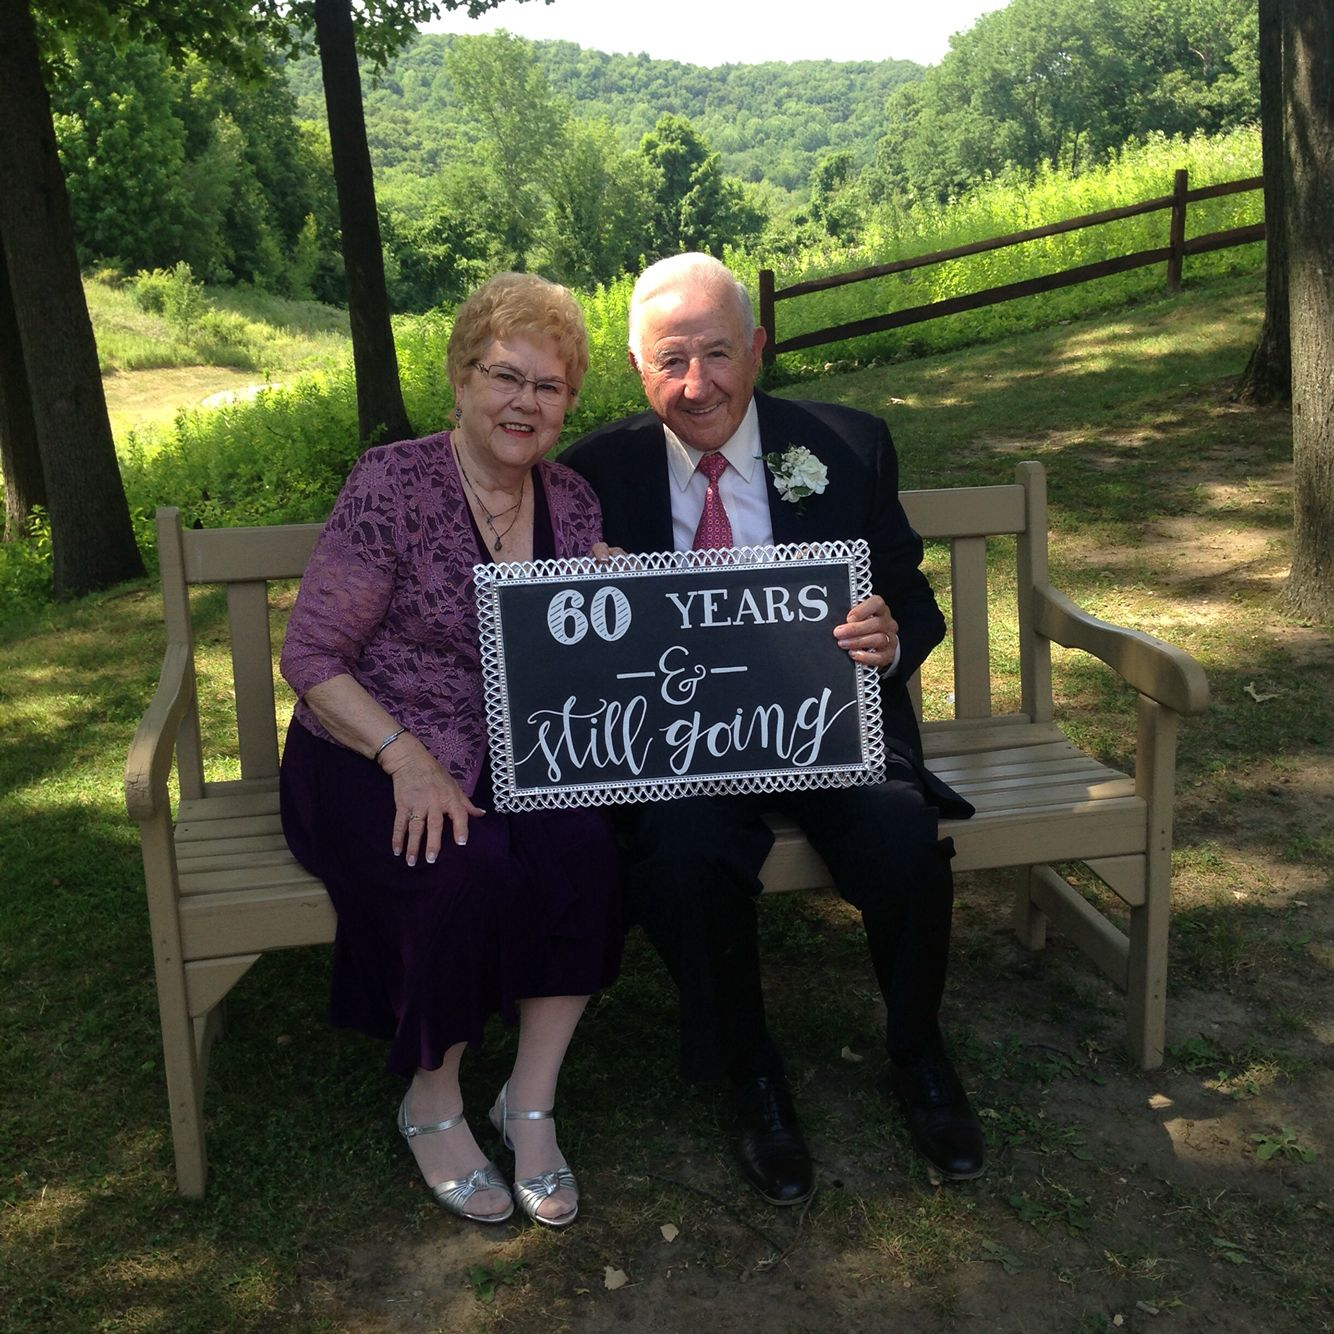 Diamond Wedding Anniversary Gifts For Grandparents: 60th Wedding Anniversary In 2019